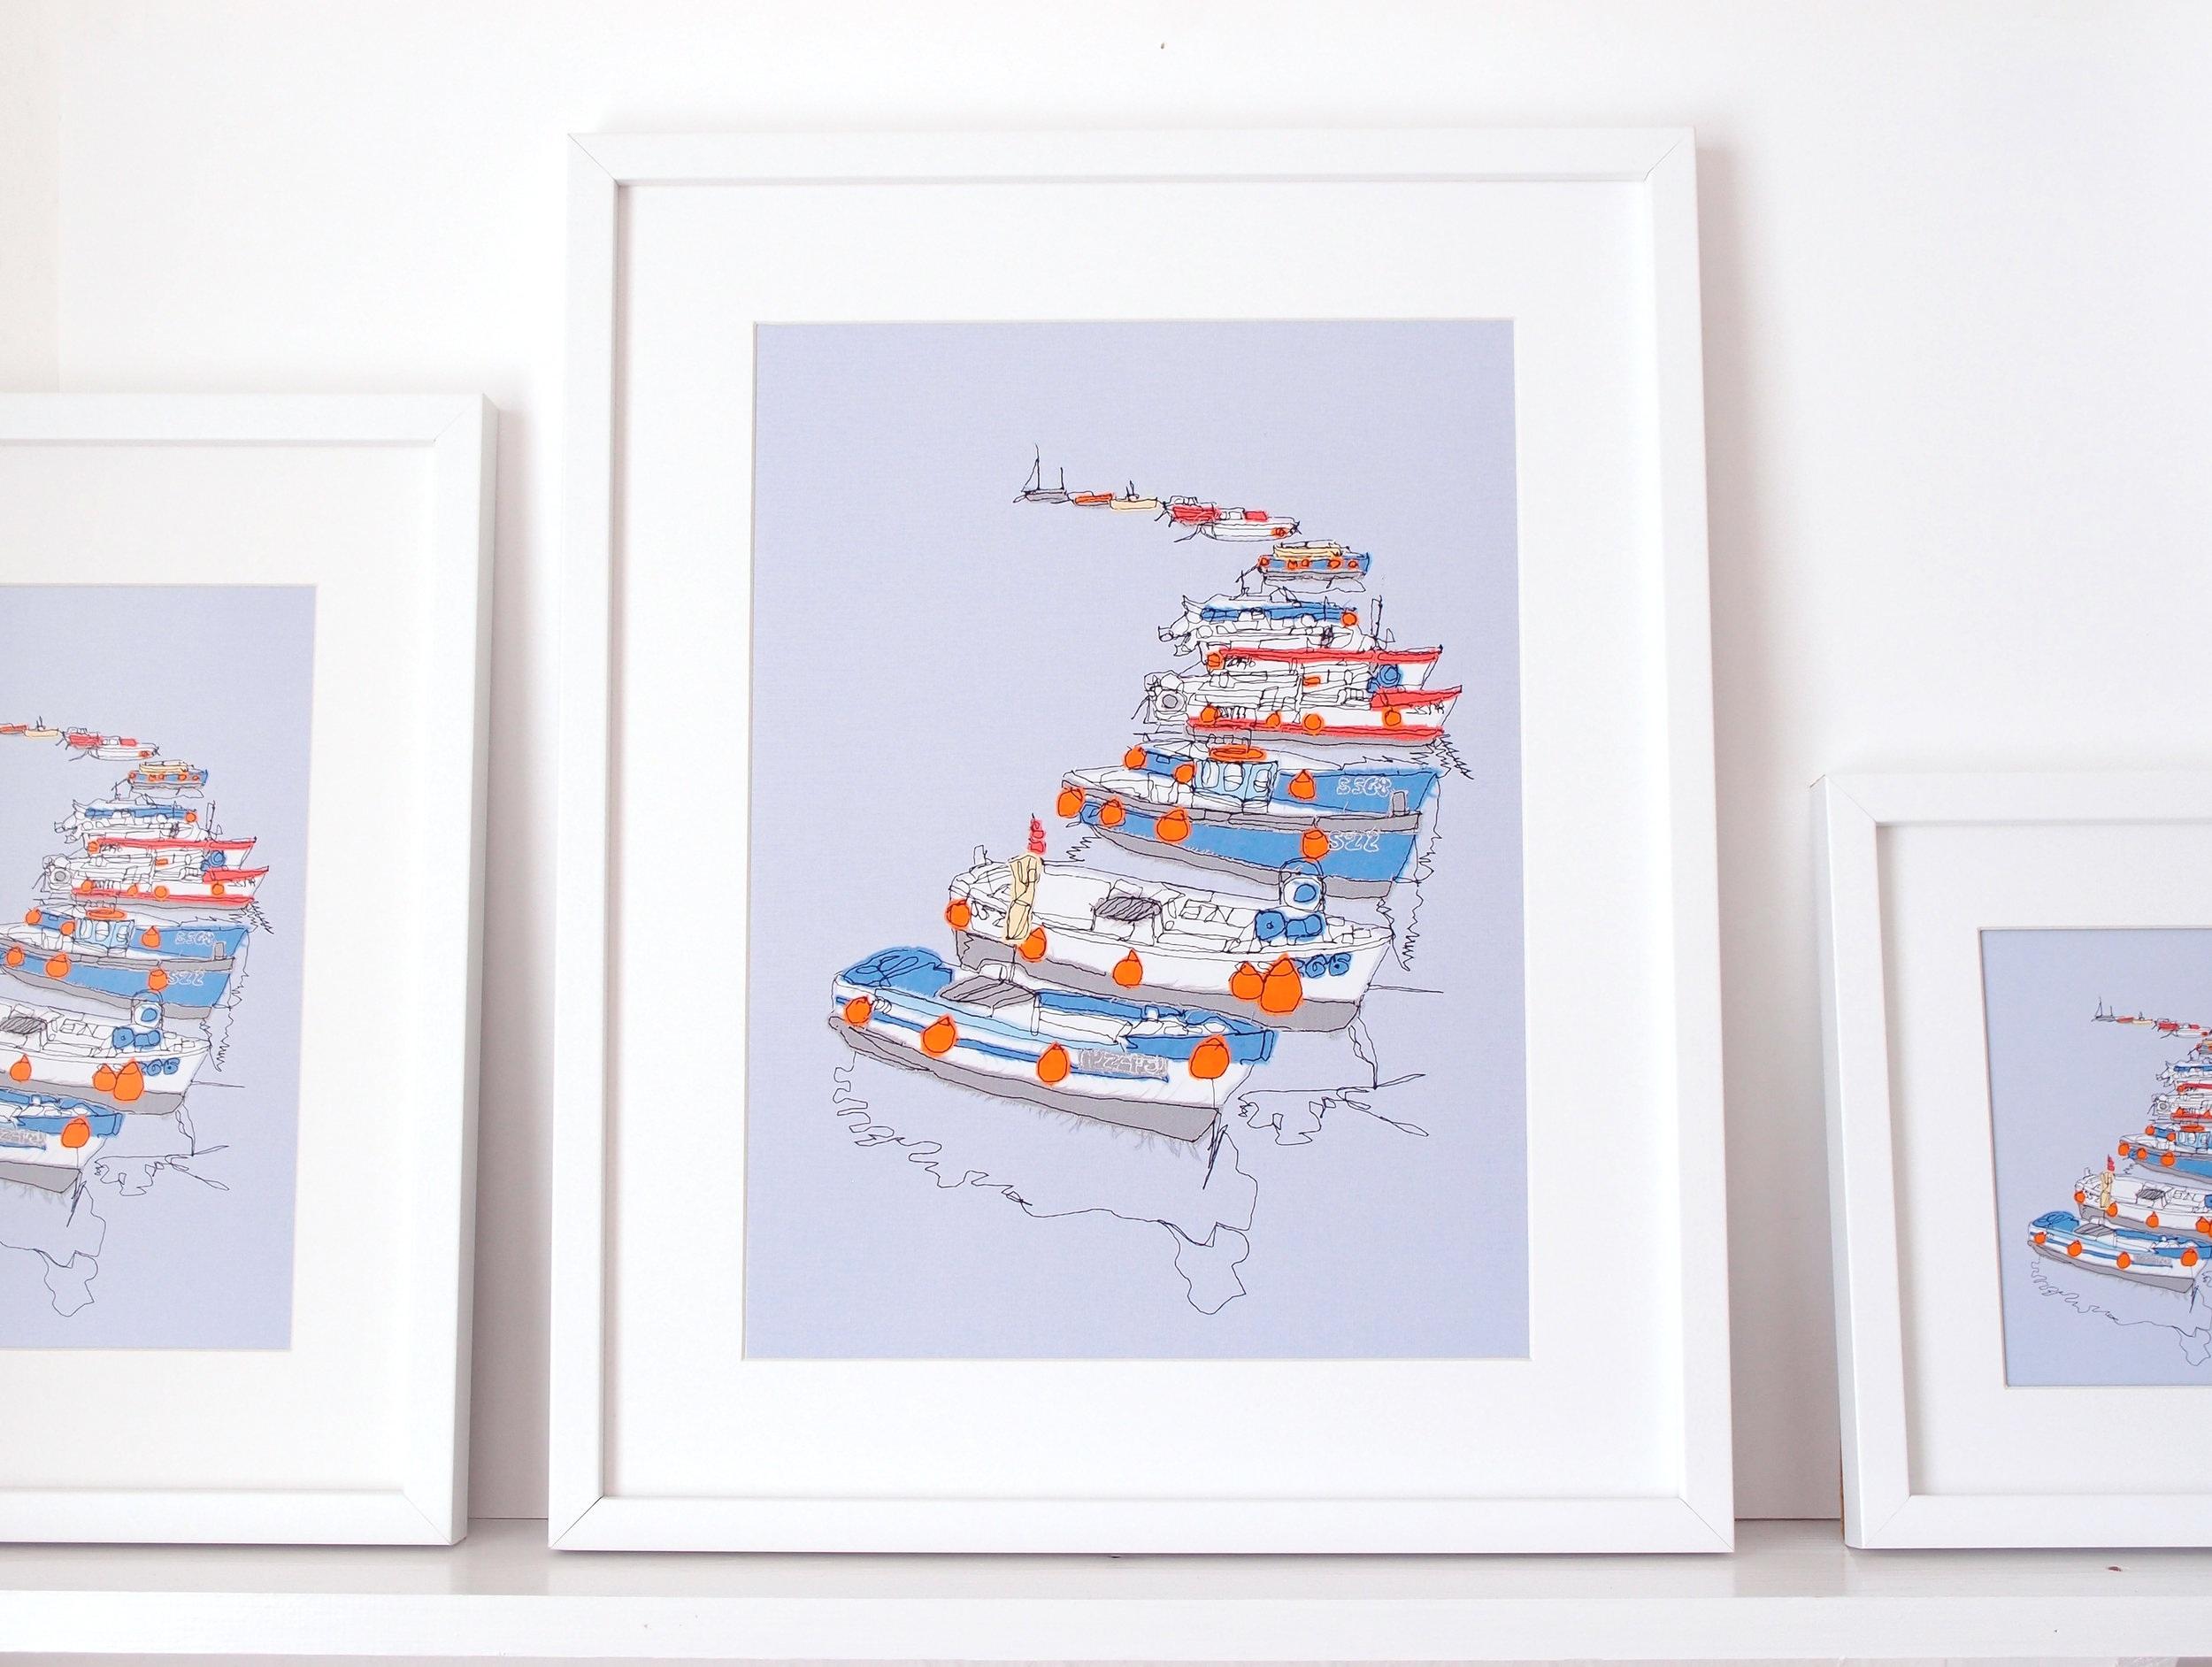 Cornish Boats - 3 Prints.jpg